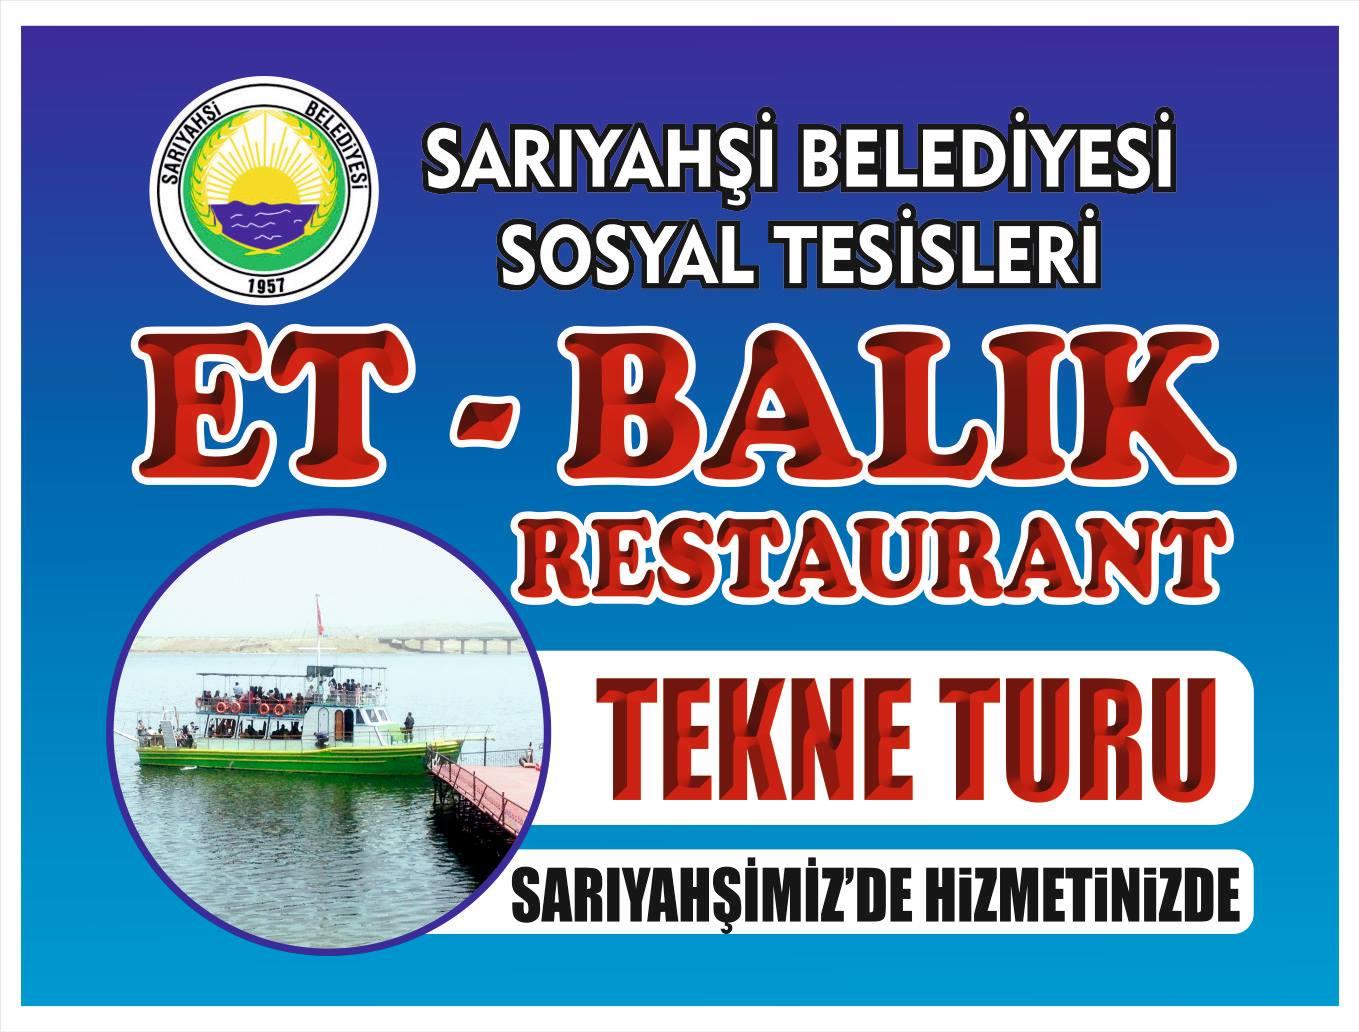 Aksaray'da Tekne Turu